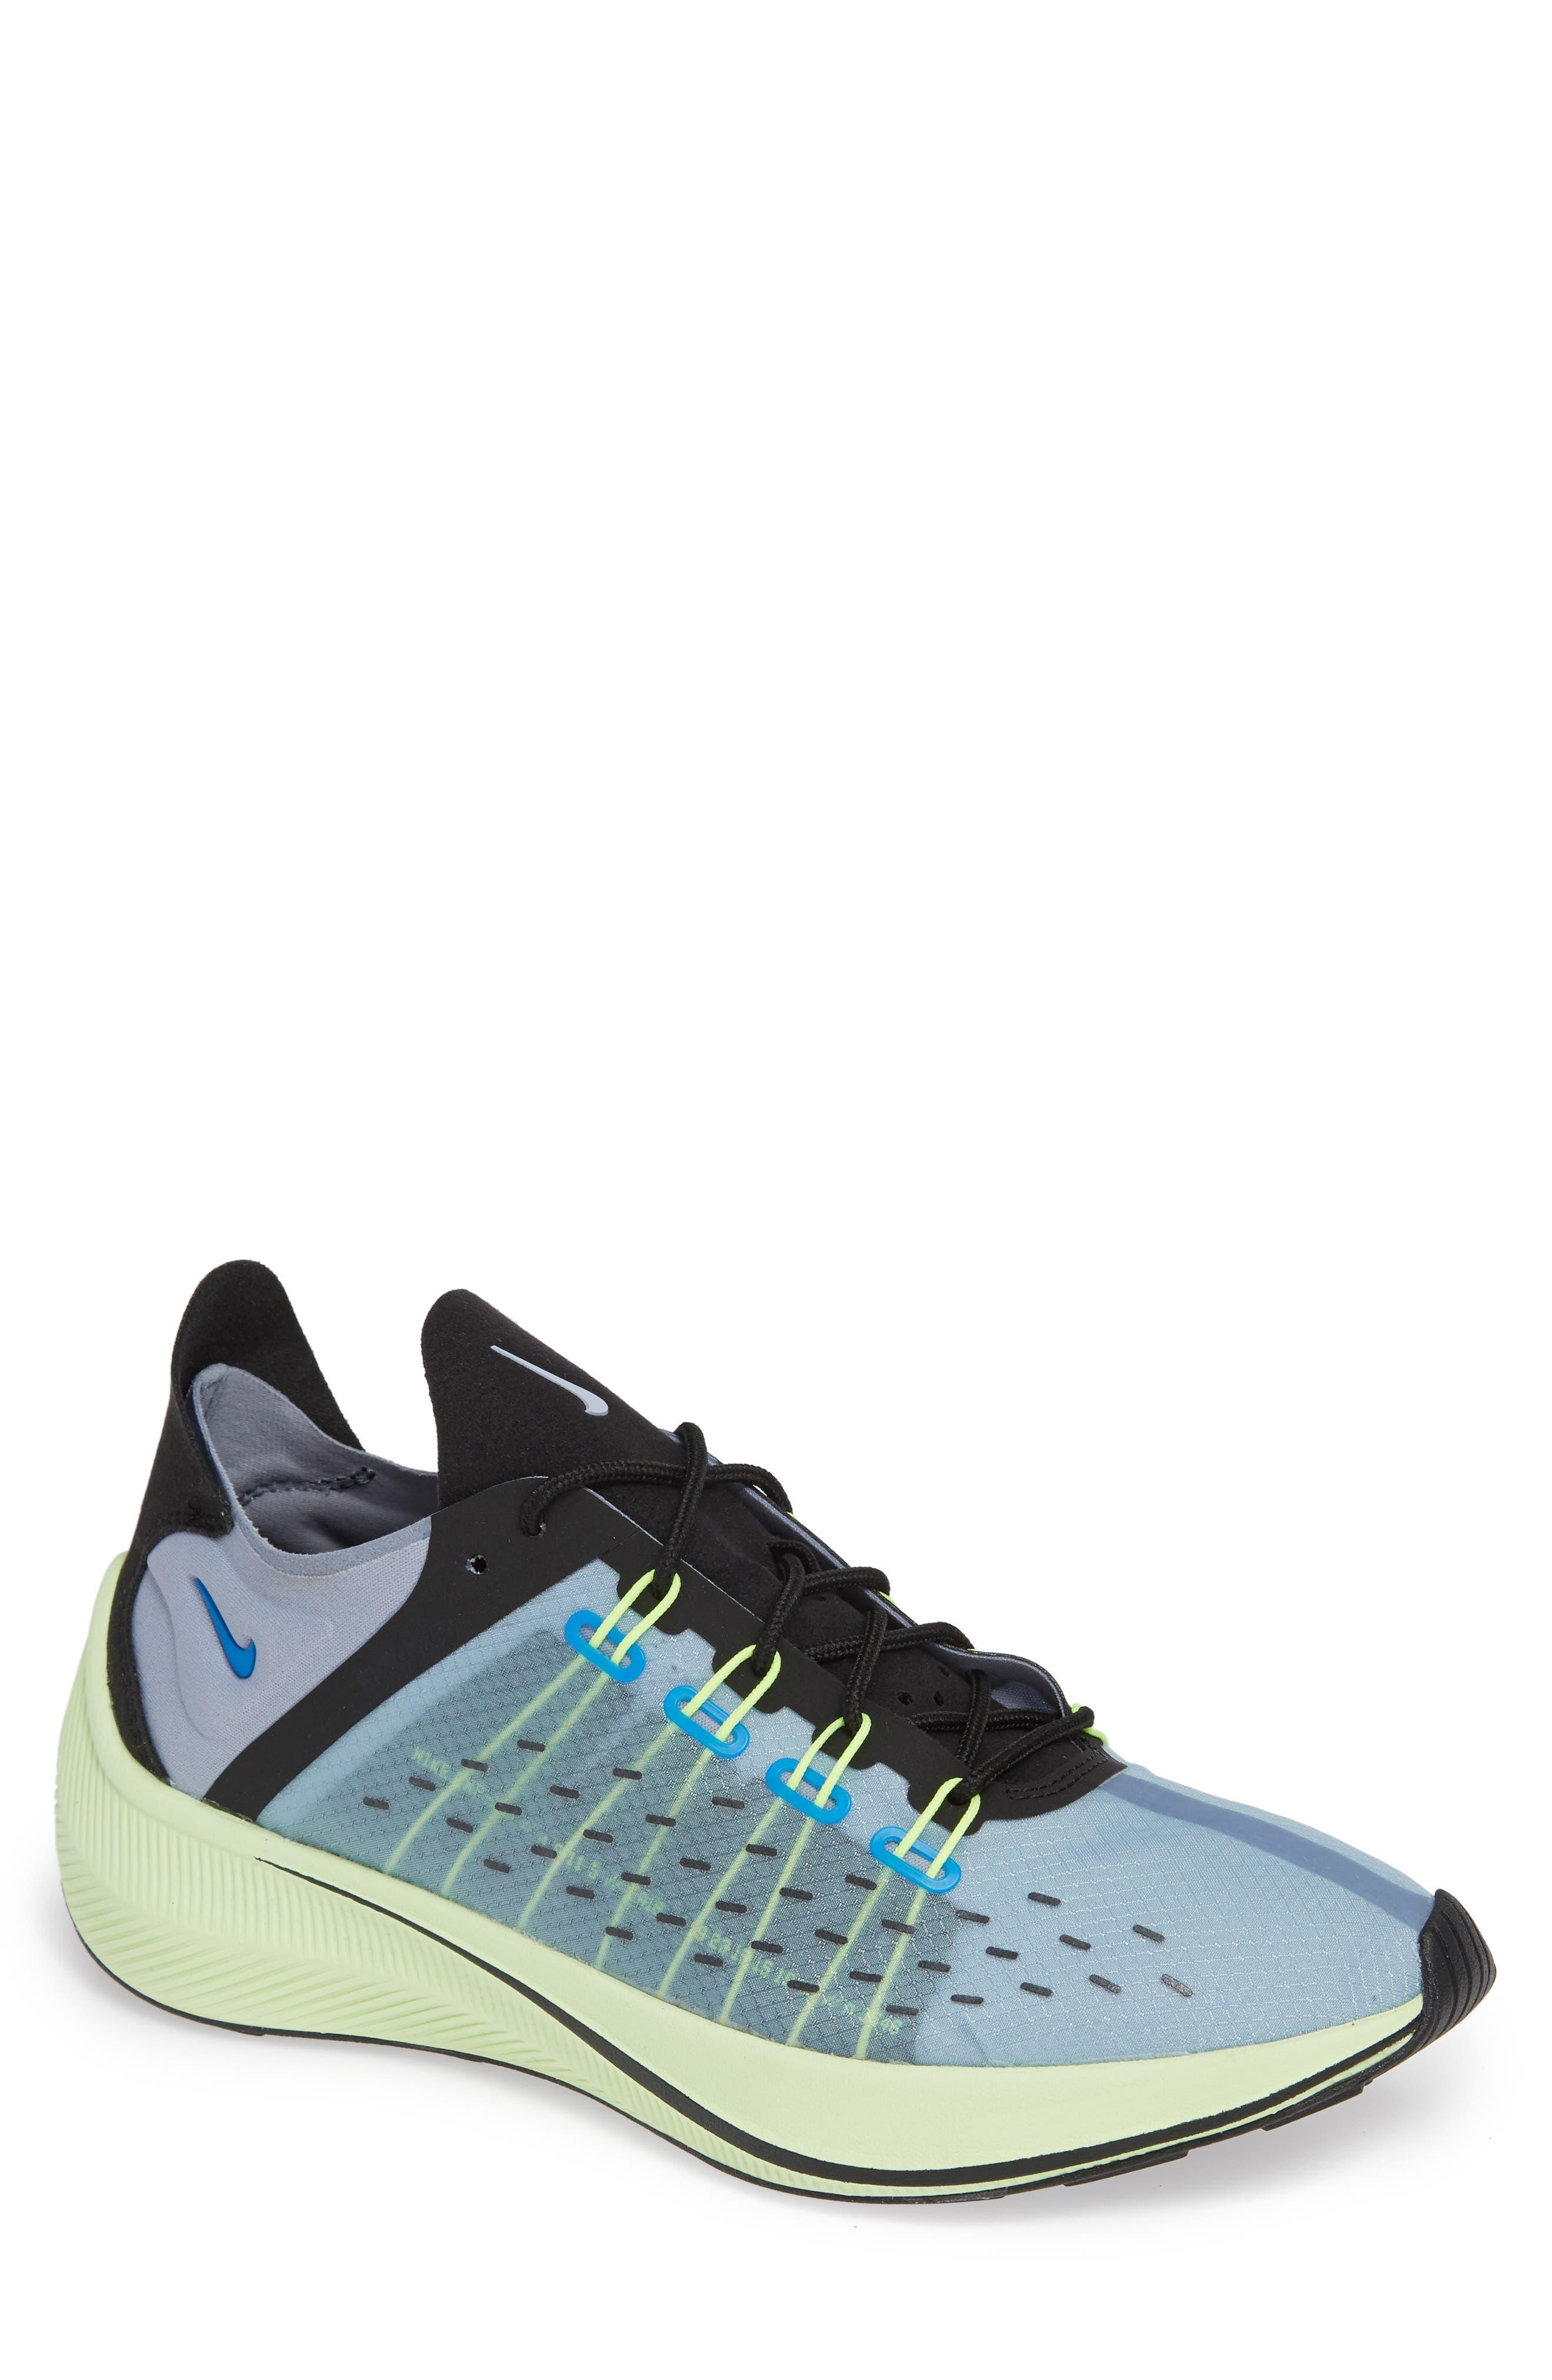 EXP-X14 Running Shoe,                         Main,                         color, PHOTO BLUE/ GLACIER GREY